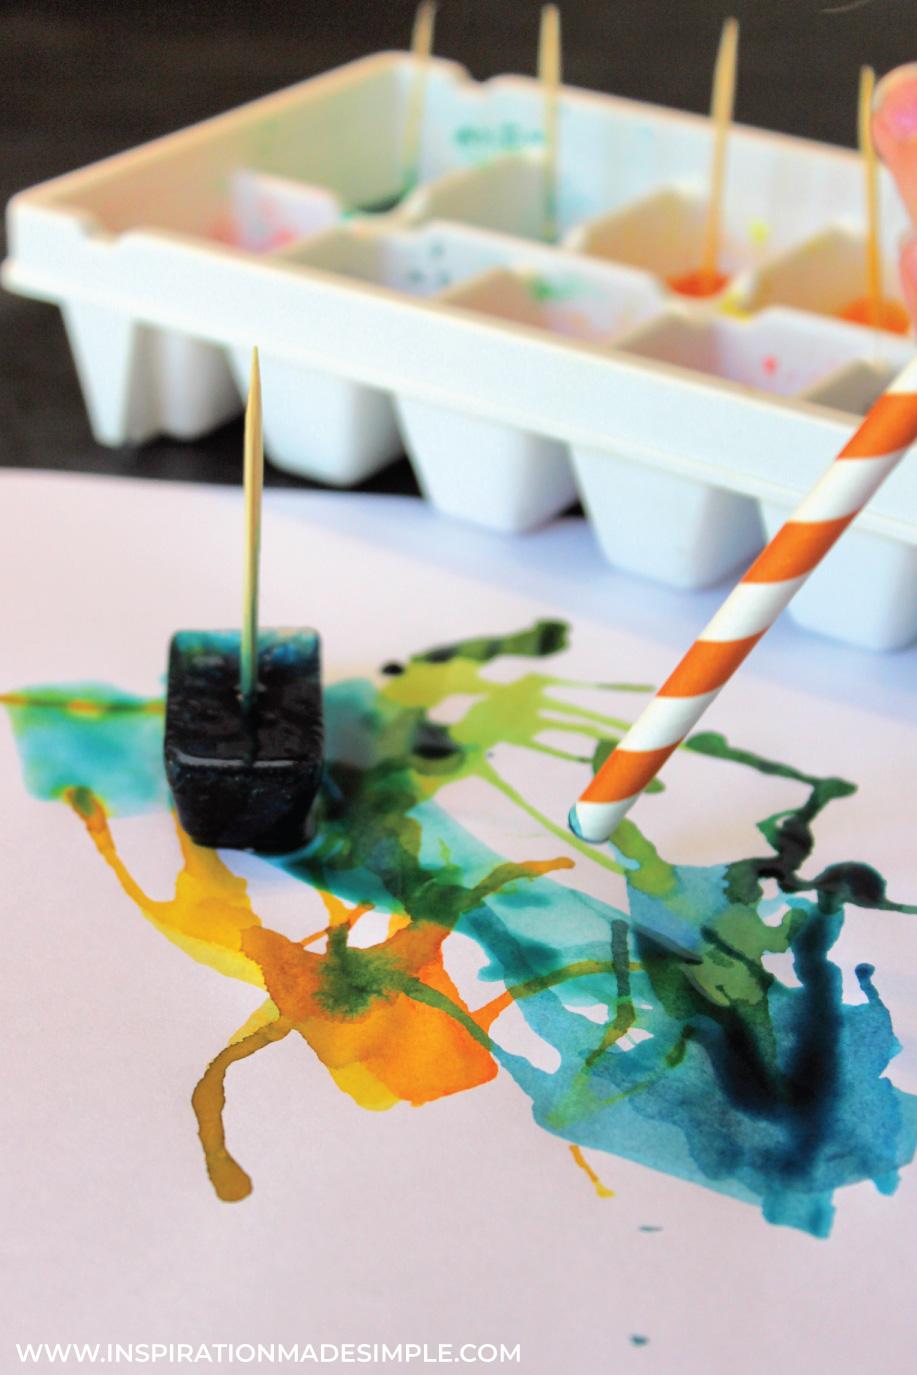 Blow Painting using Straws